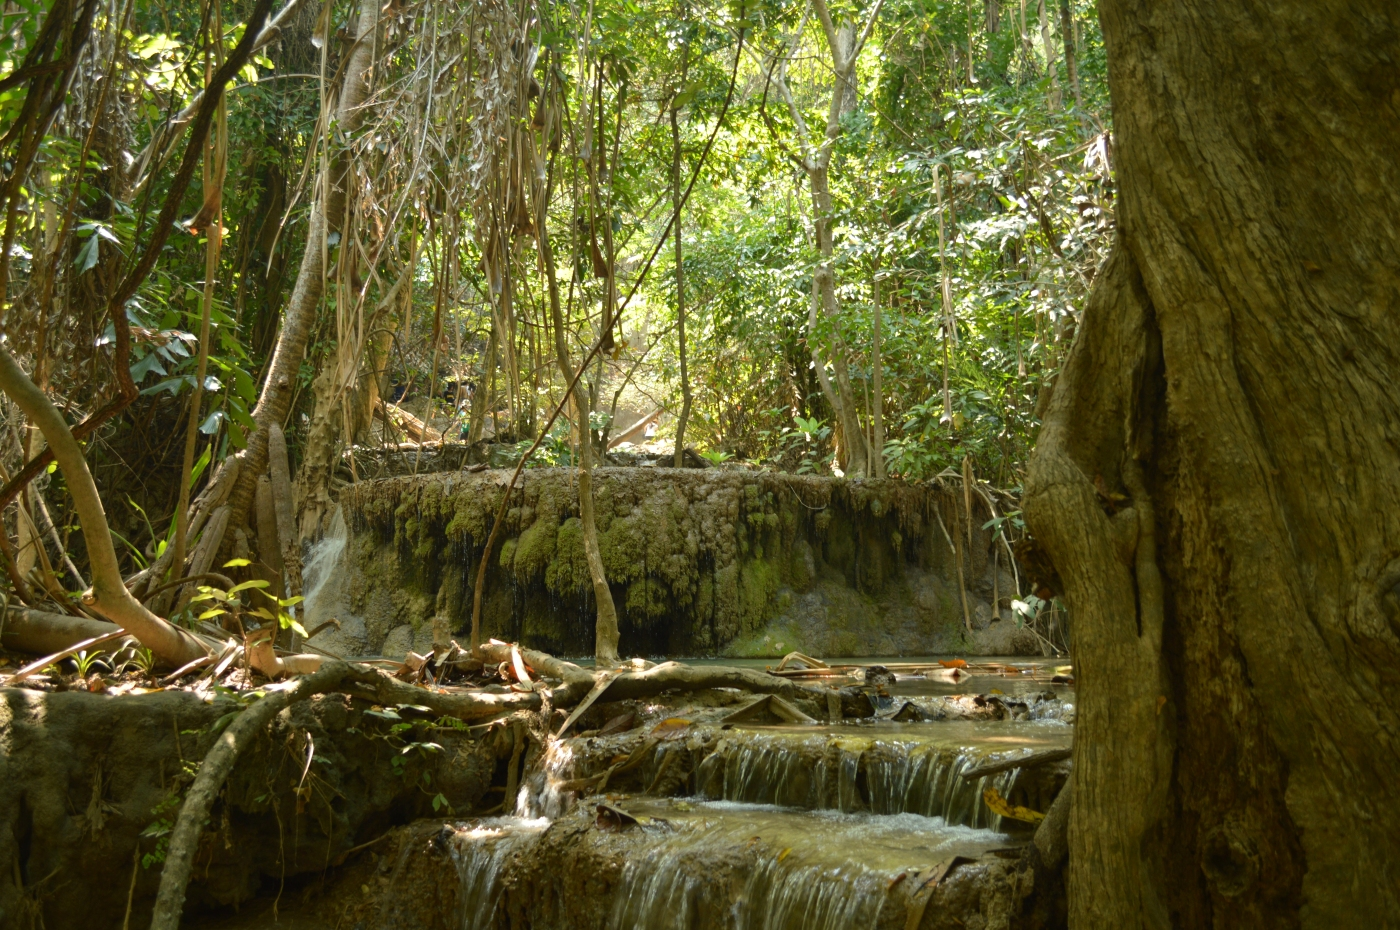 bhutan, nature, afurthershore, blog, altruism, troy-wilkinson, thoughtful, thailand